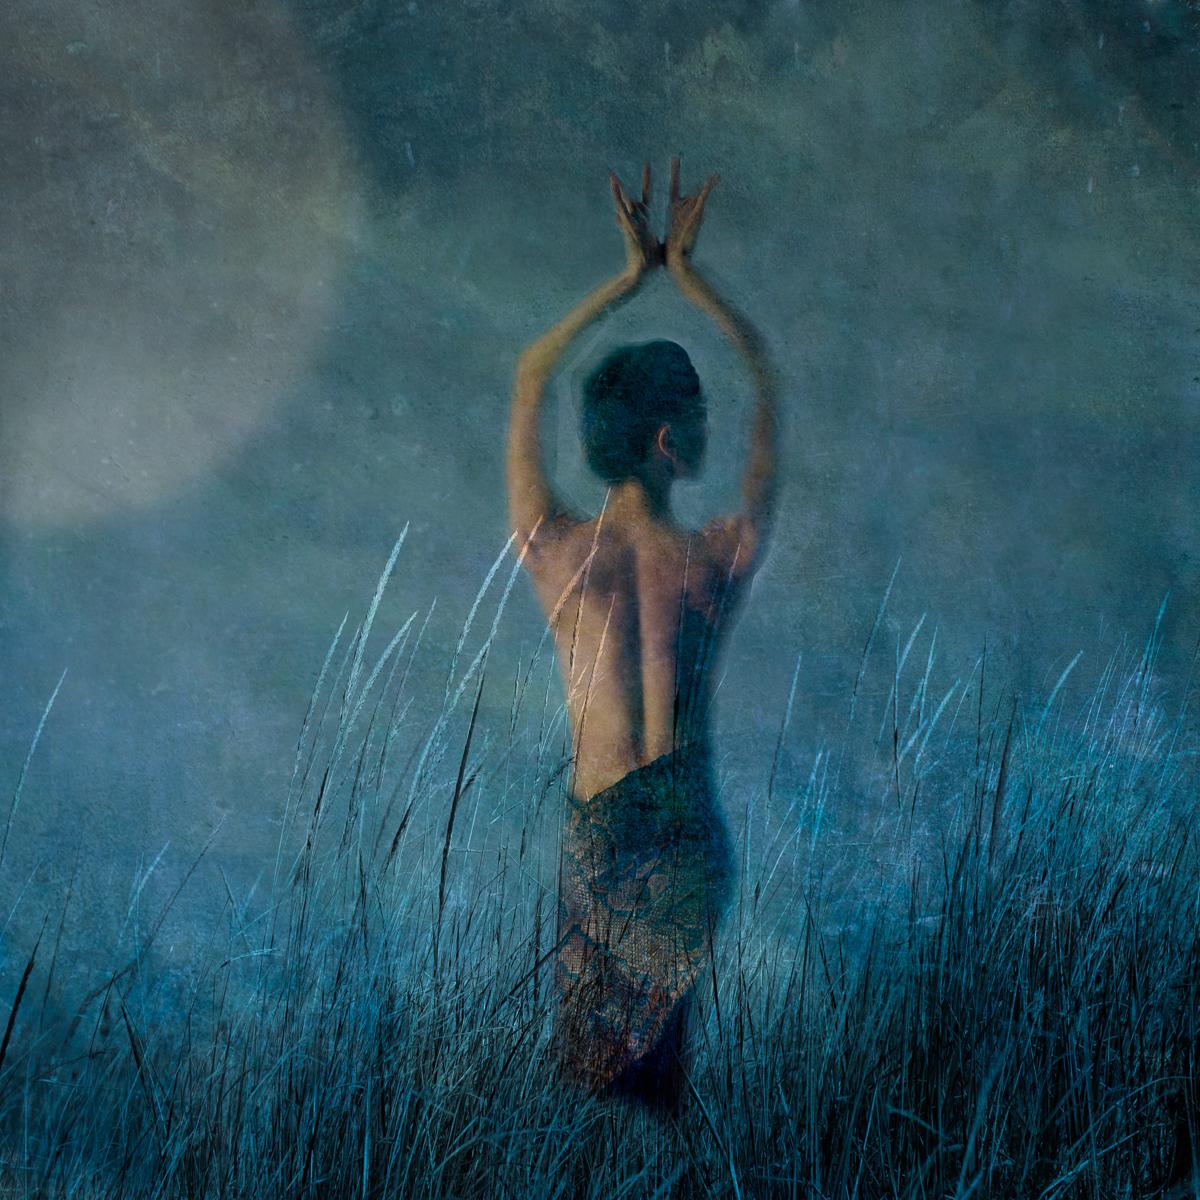 Karla Bernstein_One Night I Dreamed...Gratitude1.jpg